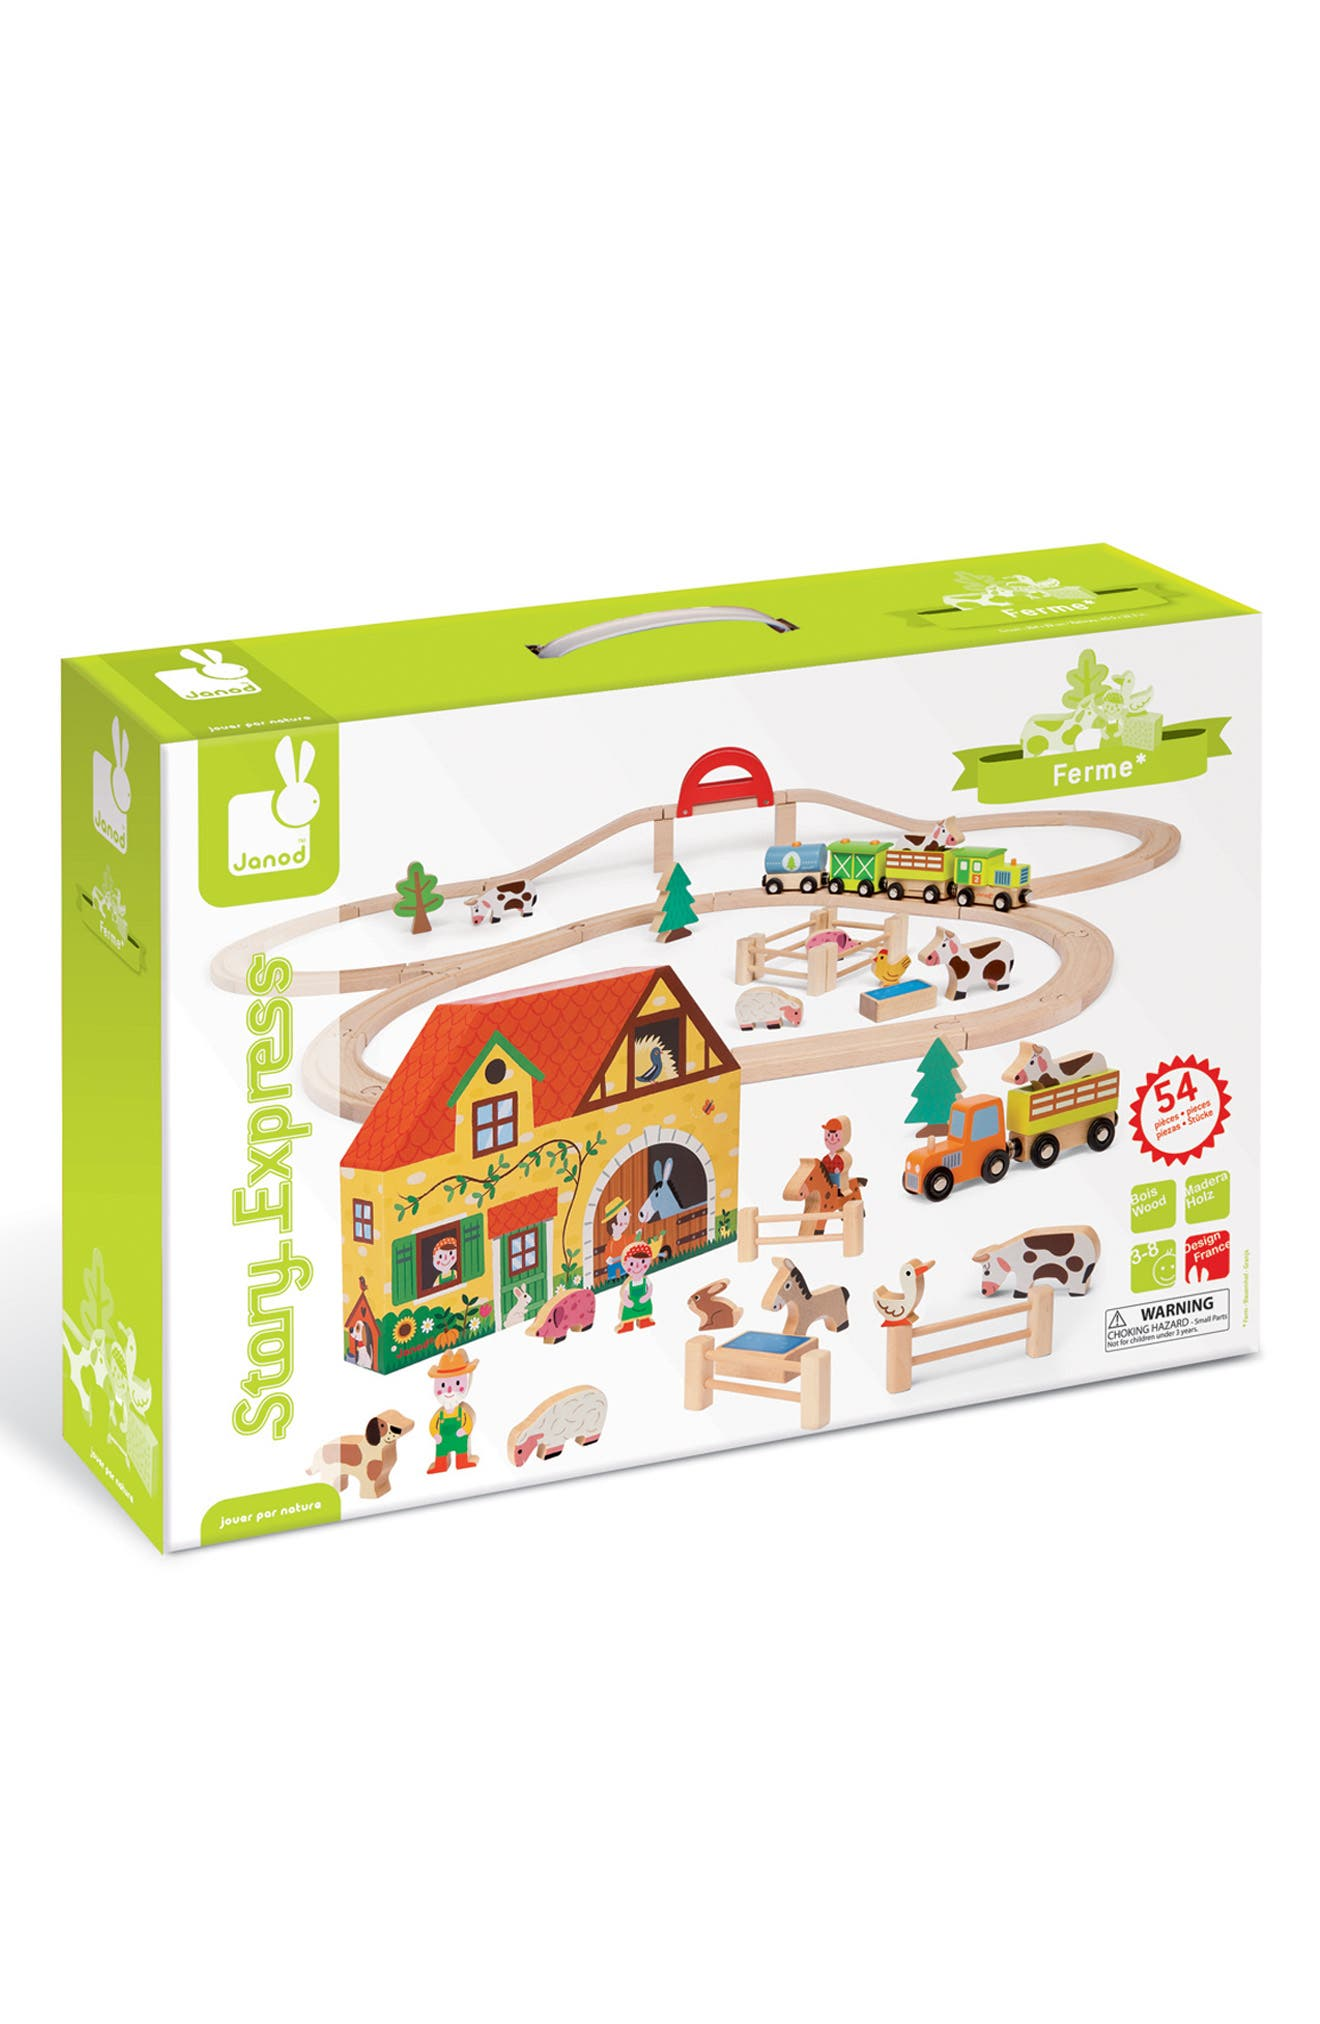 Janod Kids Toy Shop | Nordstrom